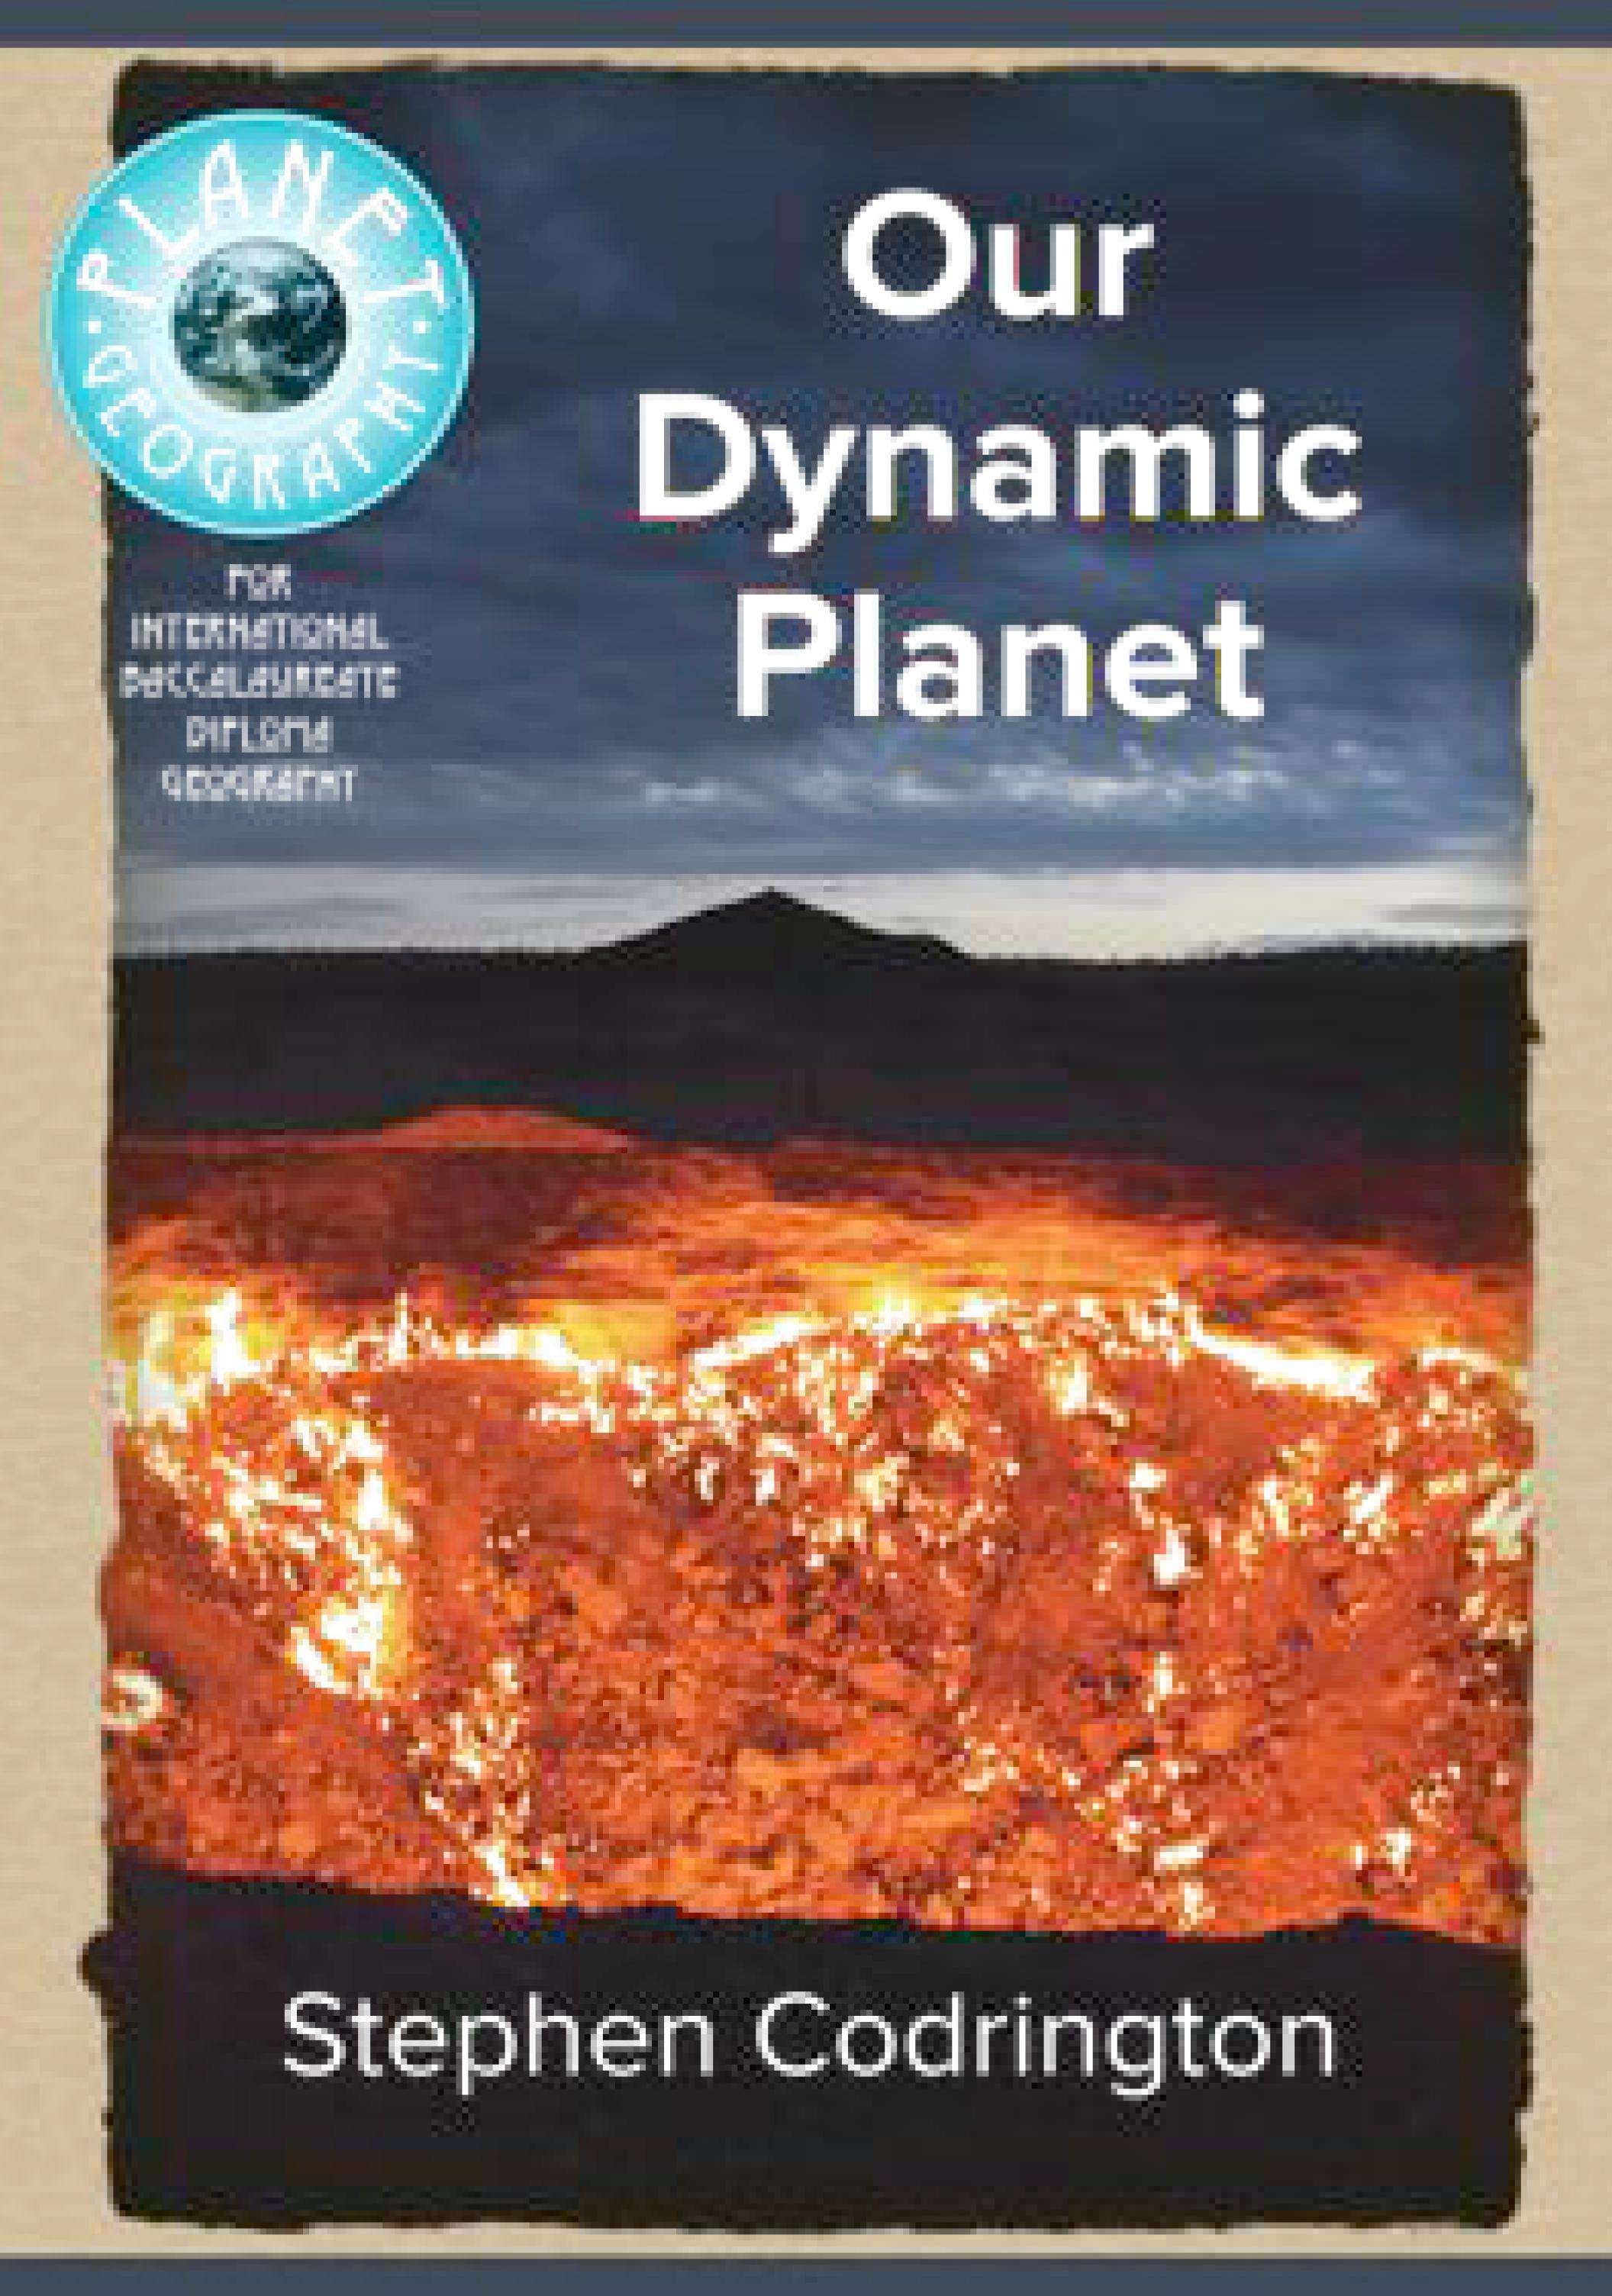 Taken From: https://www.google.ch/url?sa=i&rct=j&q=&esrc=s&source=images&cd=&ved=0ahUKEwj3teiCvp3WAhUBuxQKHc9mA1gQjxwIAw&url=https%3A%2F%2Fwww.ibbookshop.co.uk%2Fproduct%2Four-dynamic-planetstephen-codrington%2F&psig=AFQjCNFFjVv3u3F_30Xulh8uO1A-Rr9_Xw&ust=1505231386247398